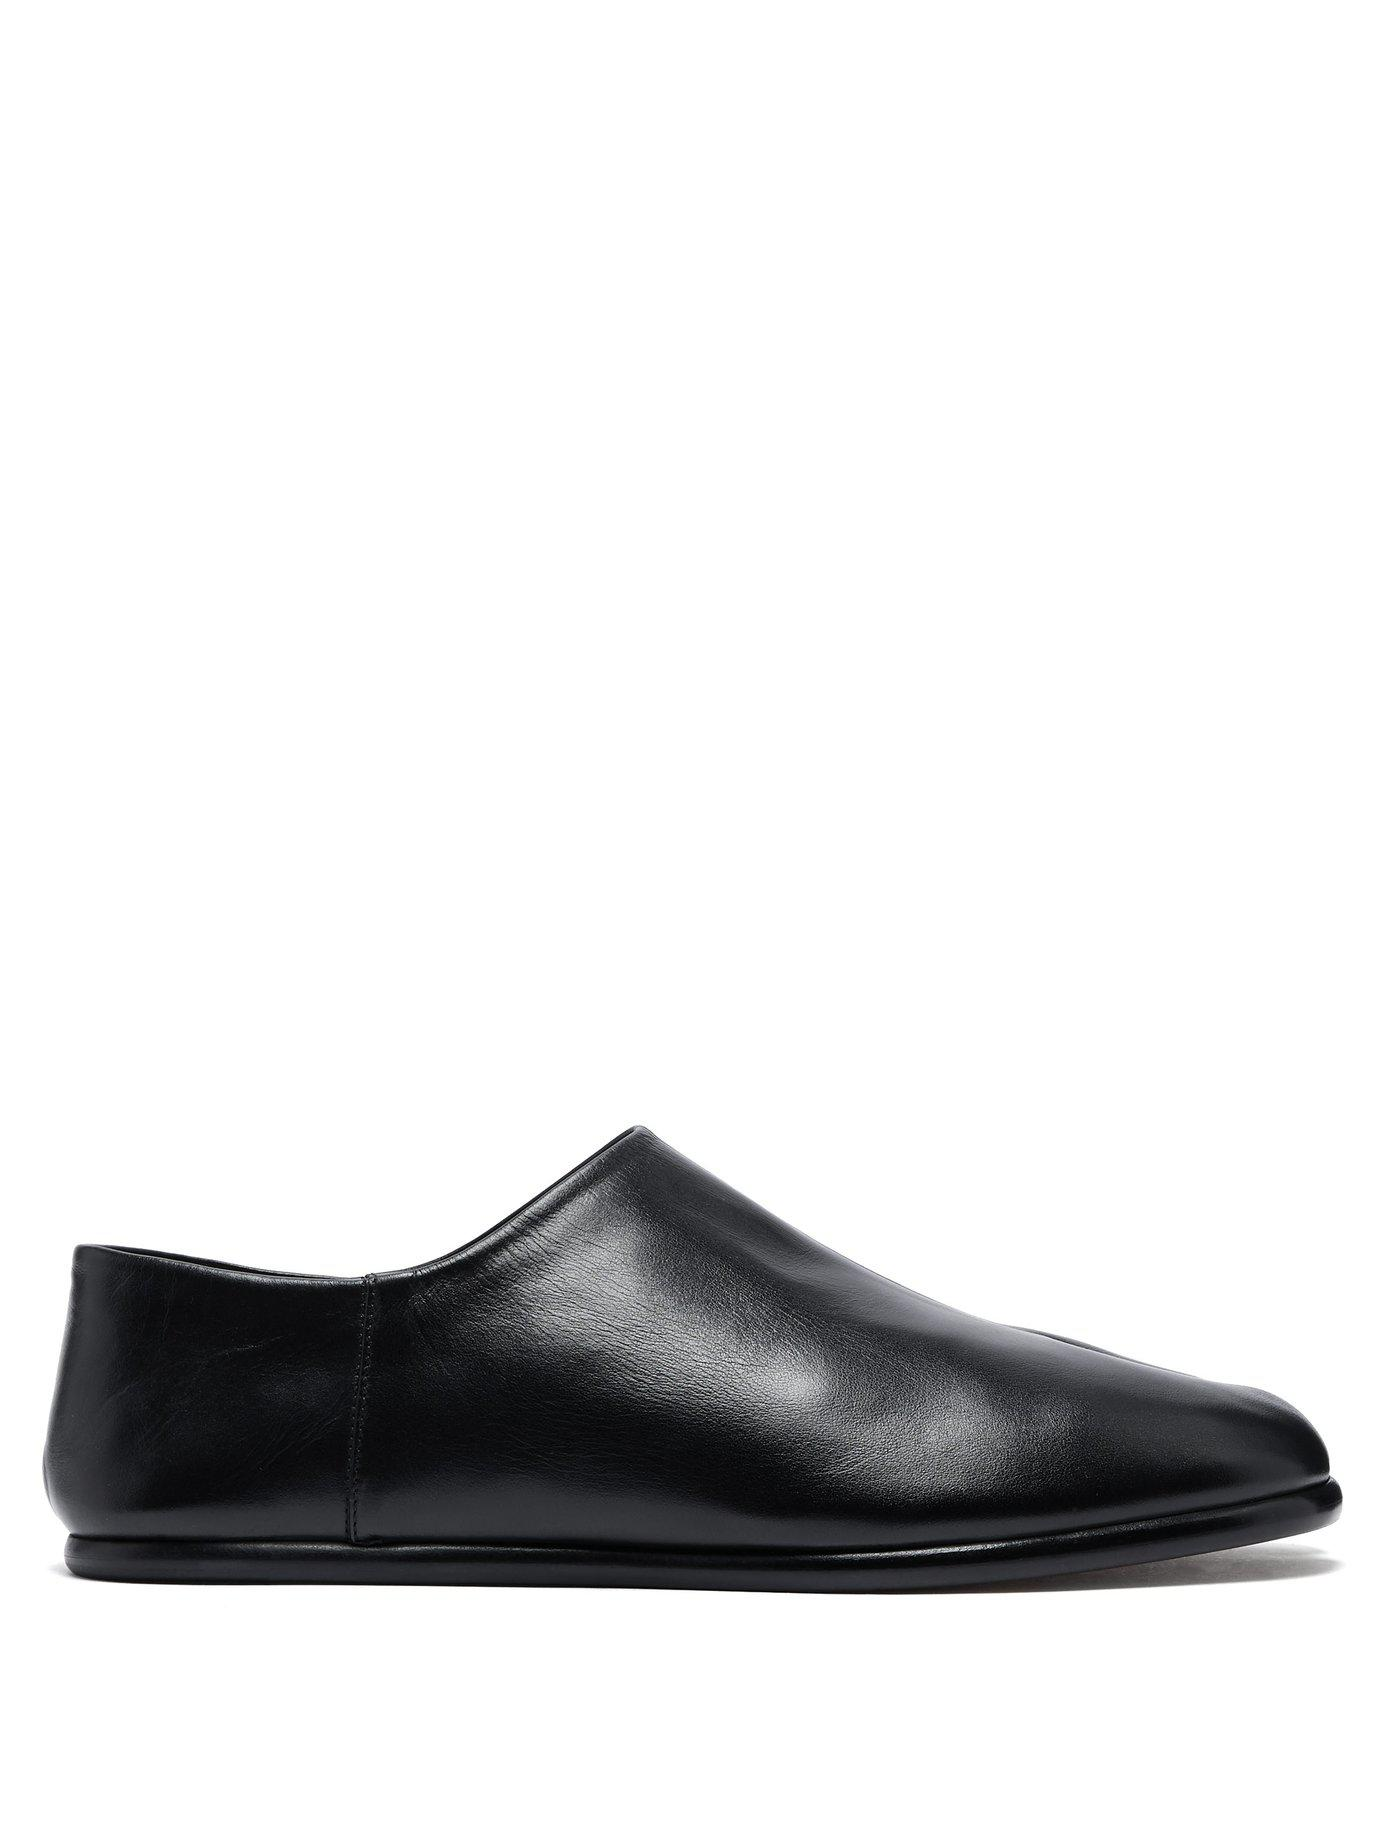 dc936c20908 Lyst - Maison Margiela Tabi Split Toe Leather Flats in Black for Men